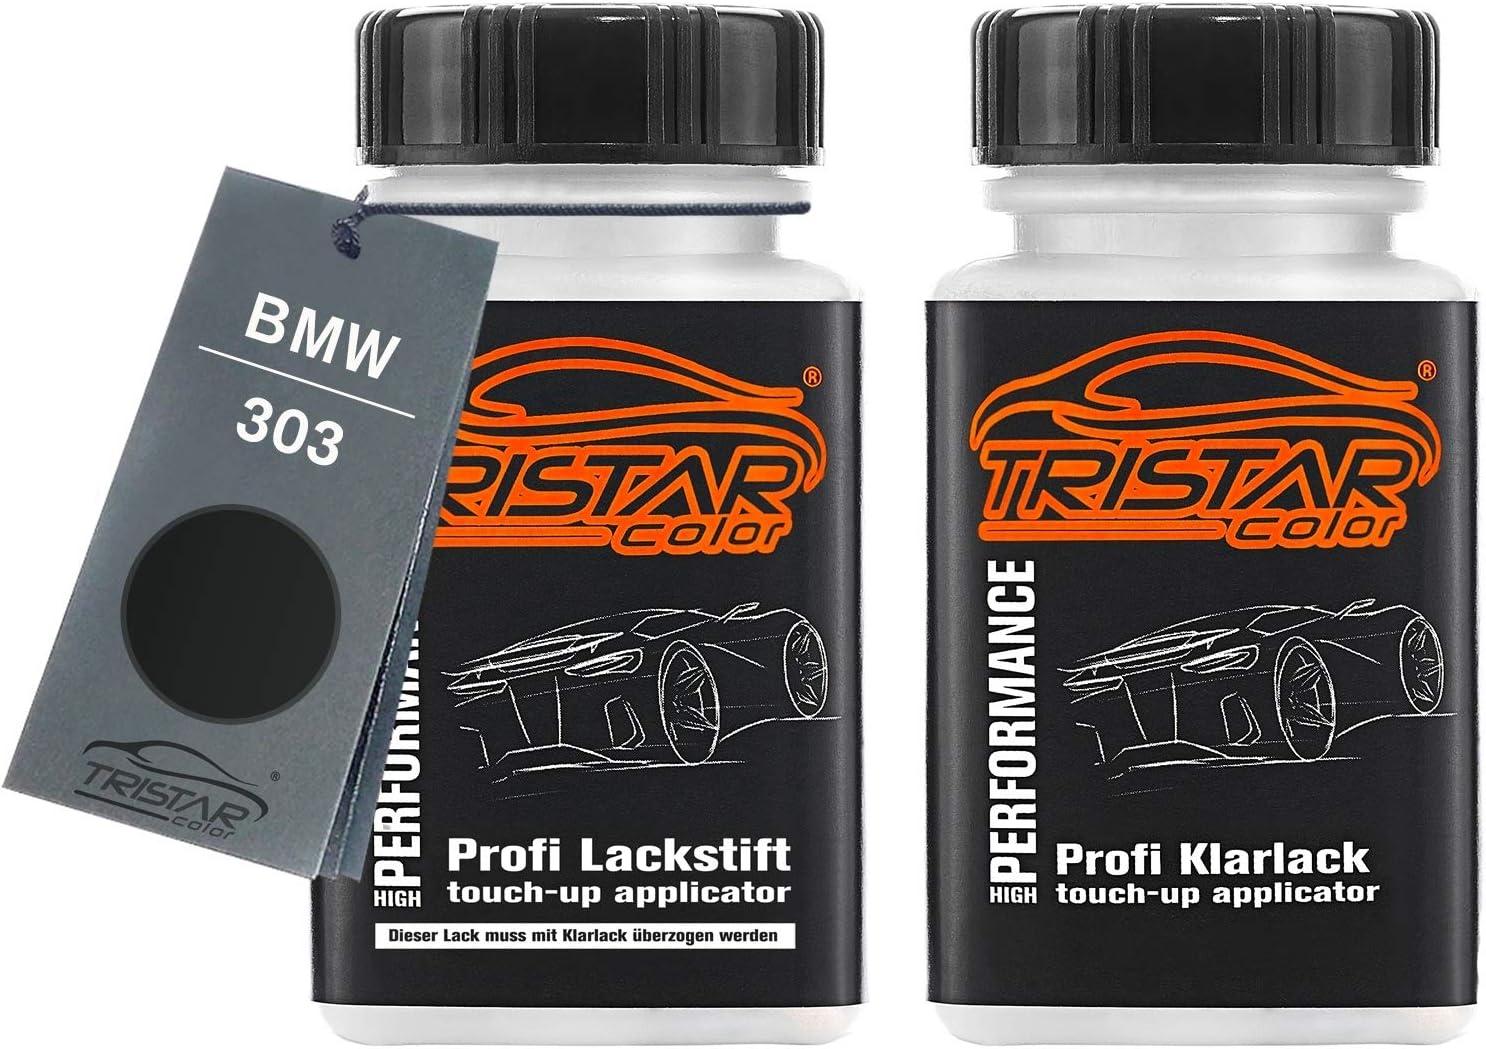 Tristarcolor Autolack Lackstift Set Für Bmw 303 Cosmosschwarz Metallic Basislack Klarlack Je 50ml Auto